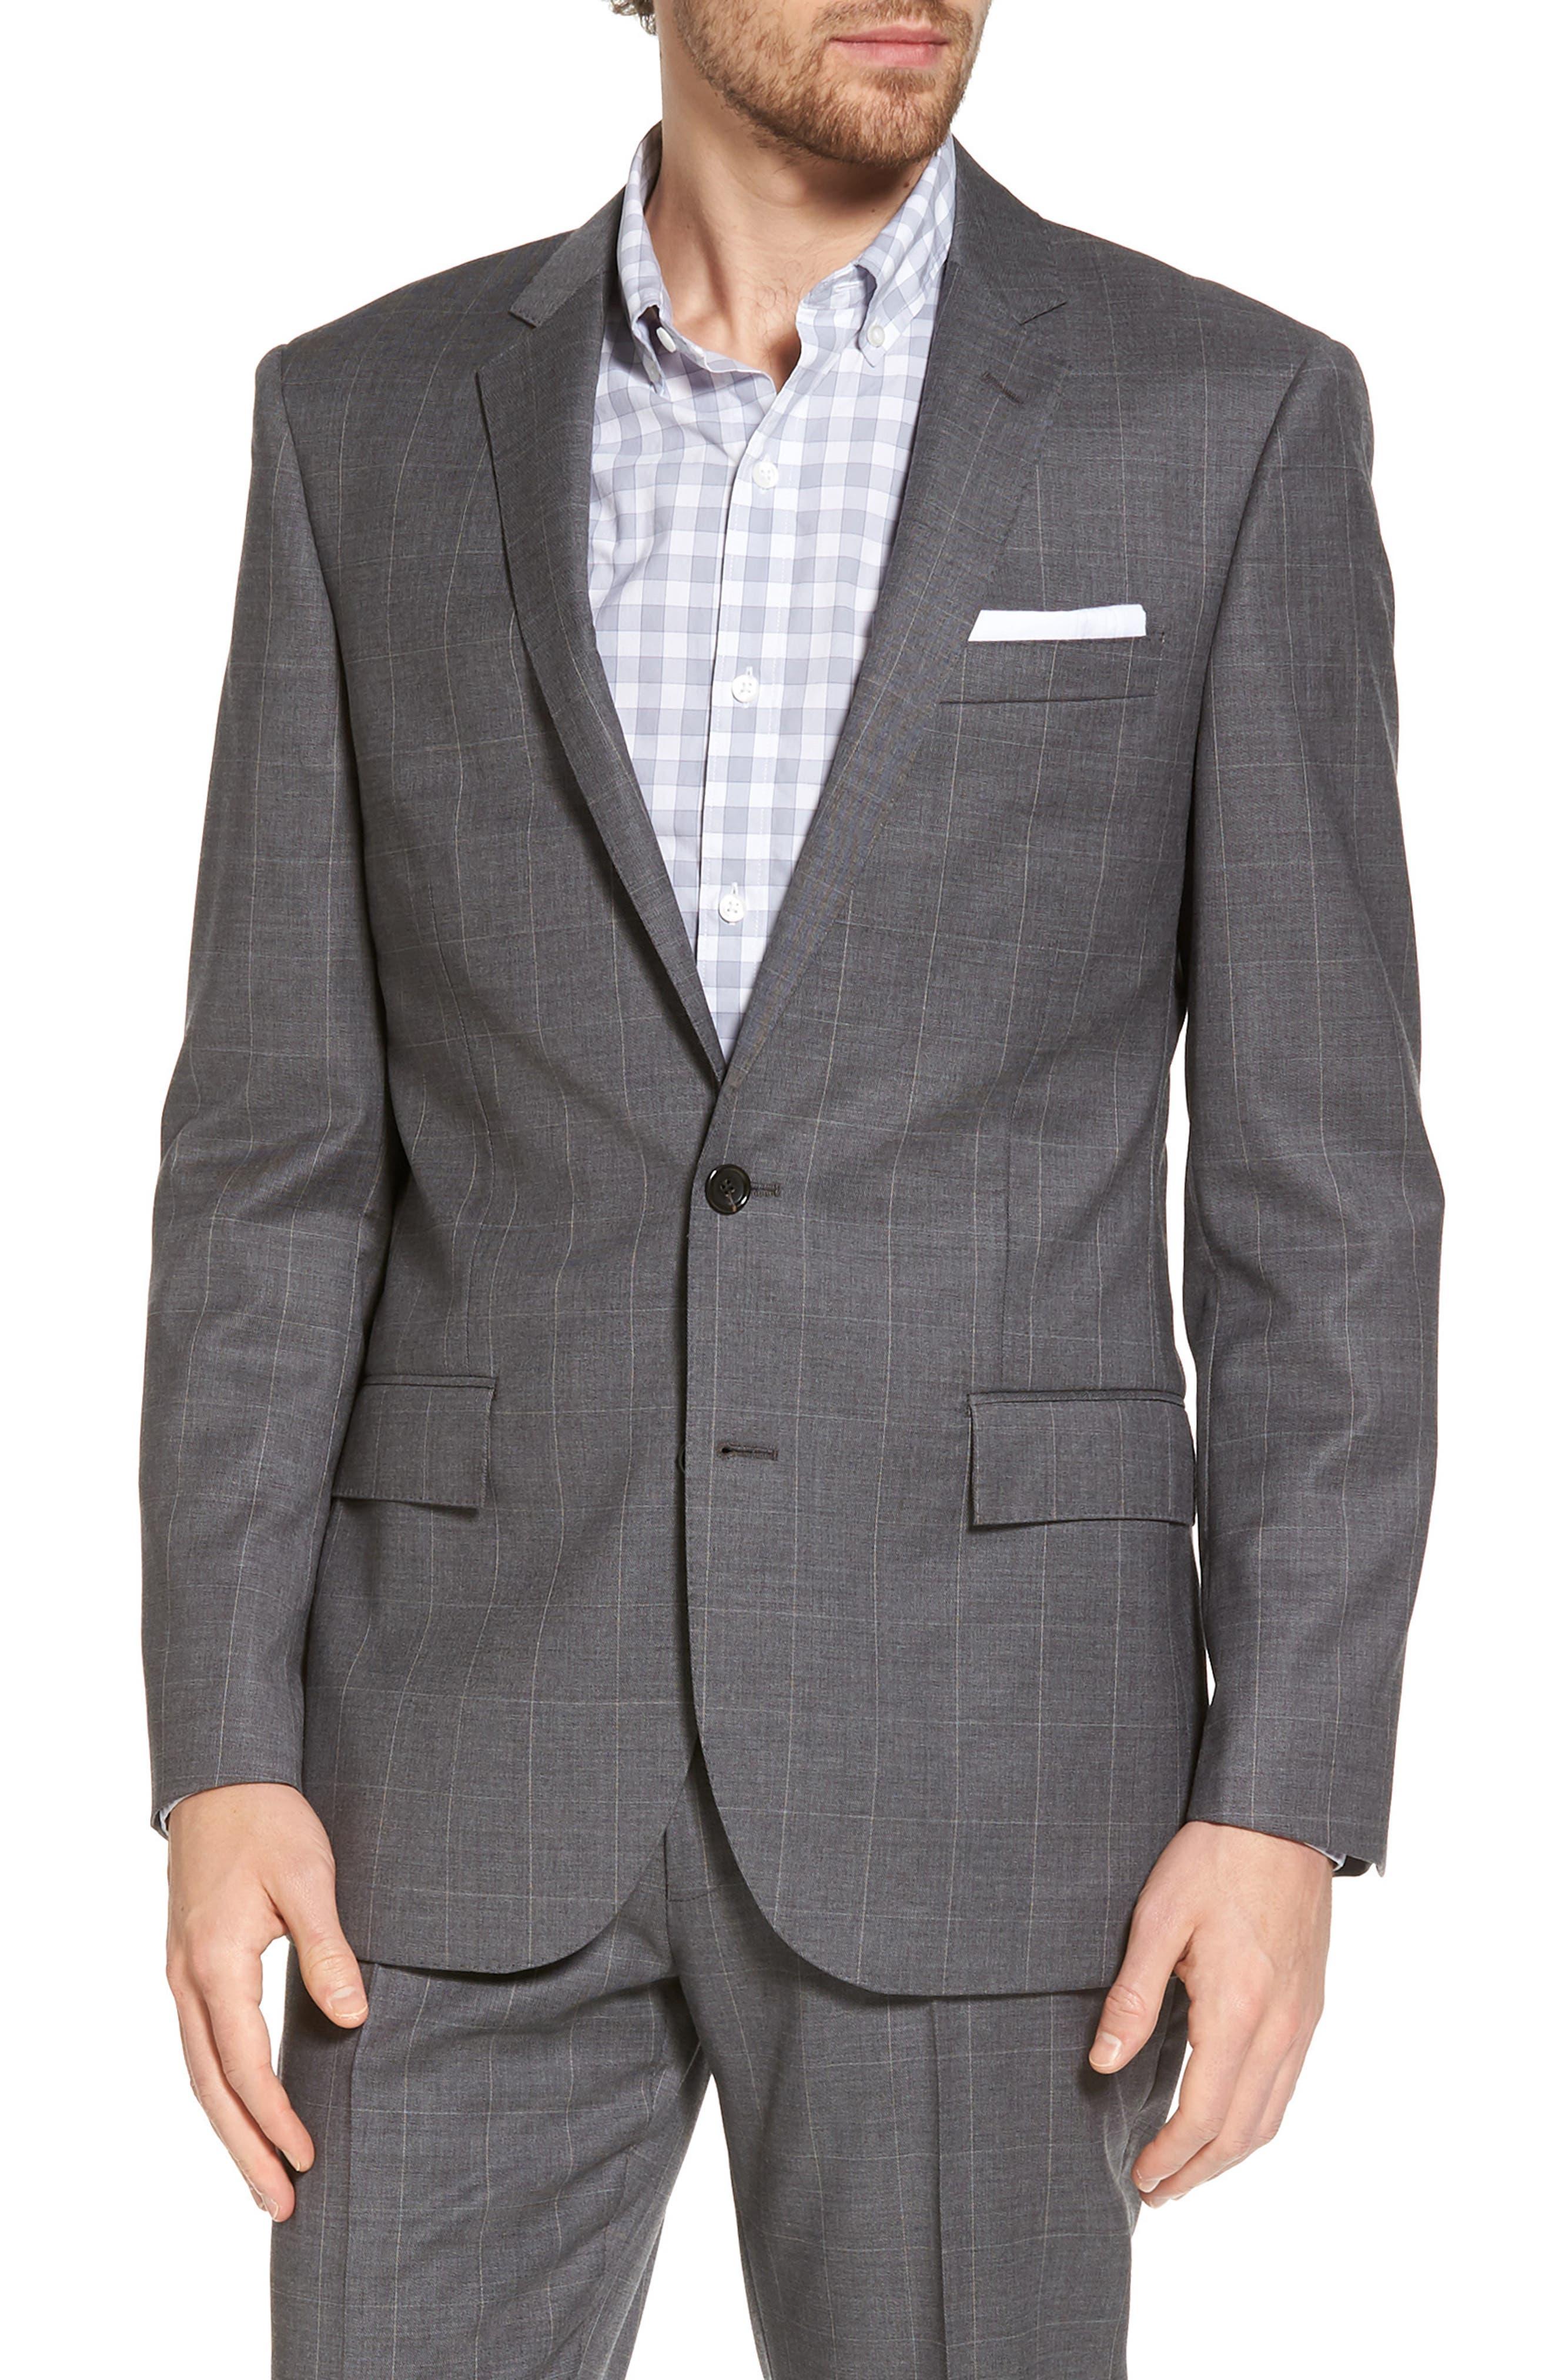 J.Crew Ludlow Wool Blend Sport Coat,                         Main,                         color, Steel Grey